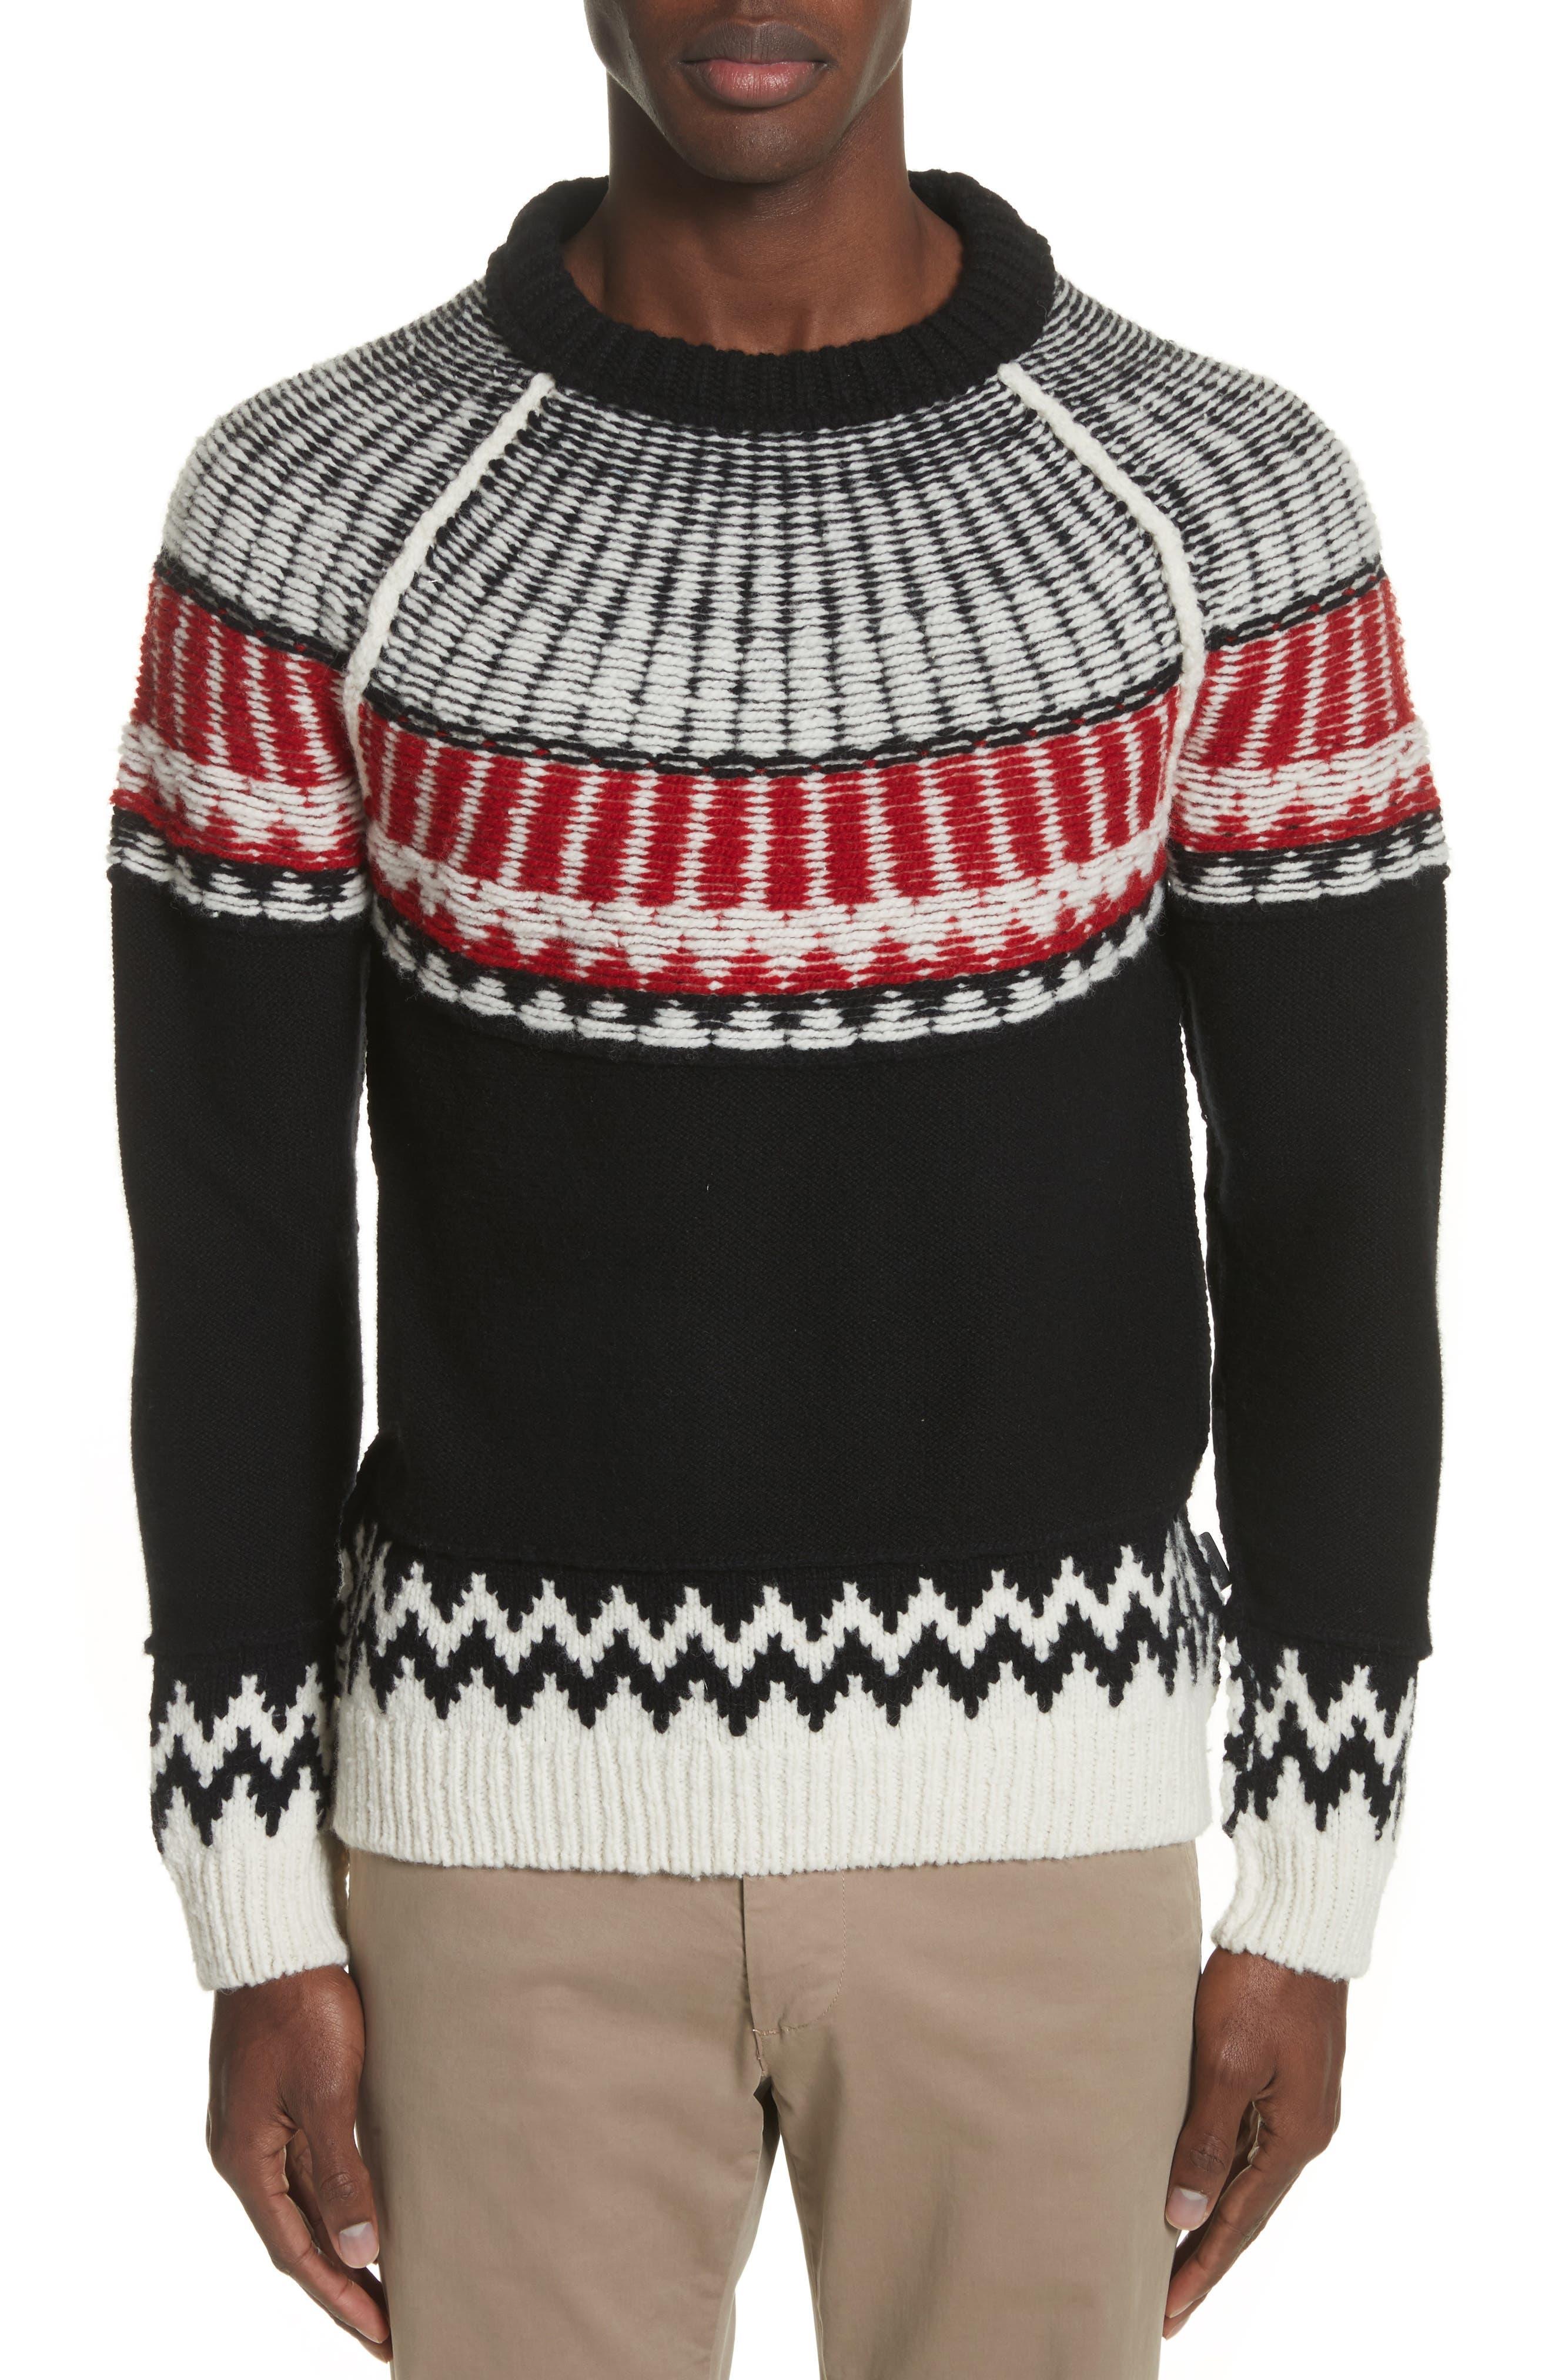 Rycroft Wool & Cashmere Blend Sweater,                         Main,                         color, 001